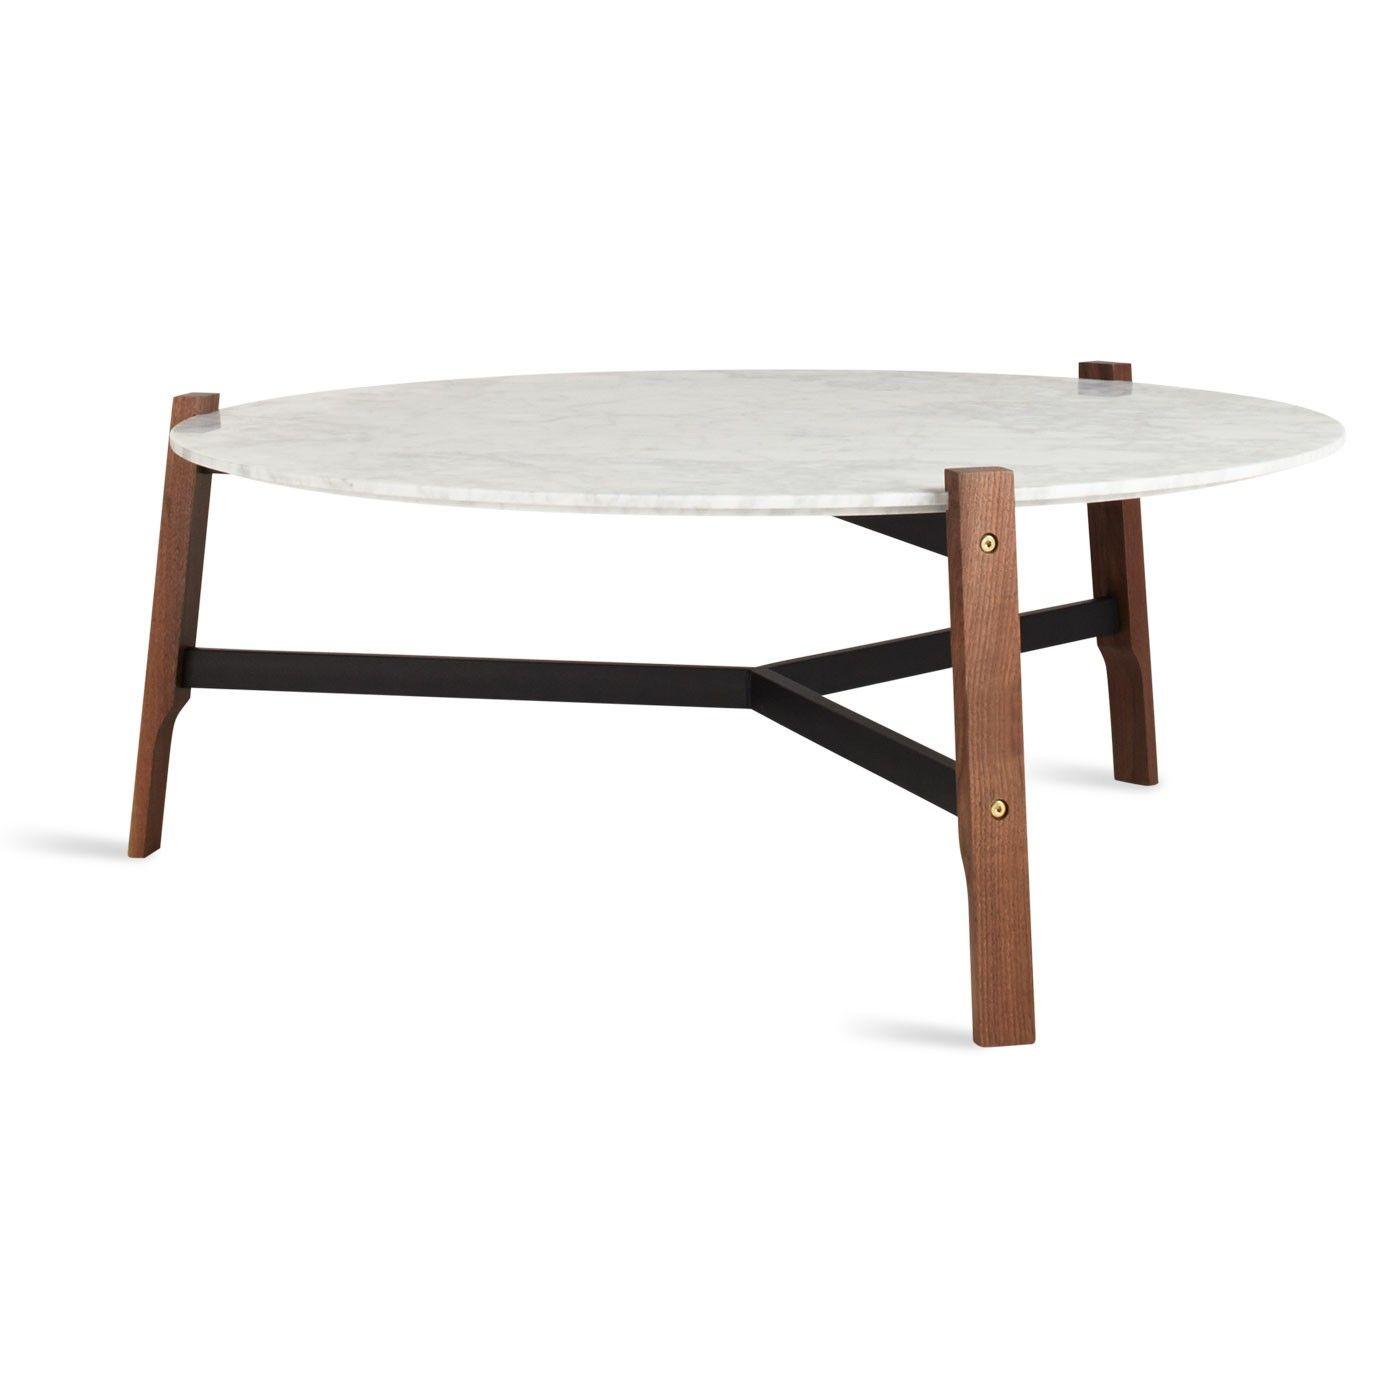 Free Range Coffee Table Round Coffee Table White Round Coffee